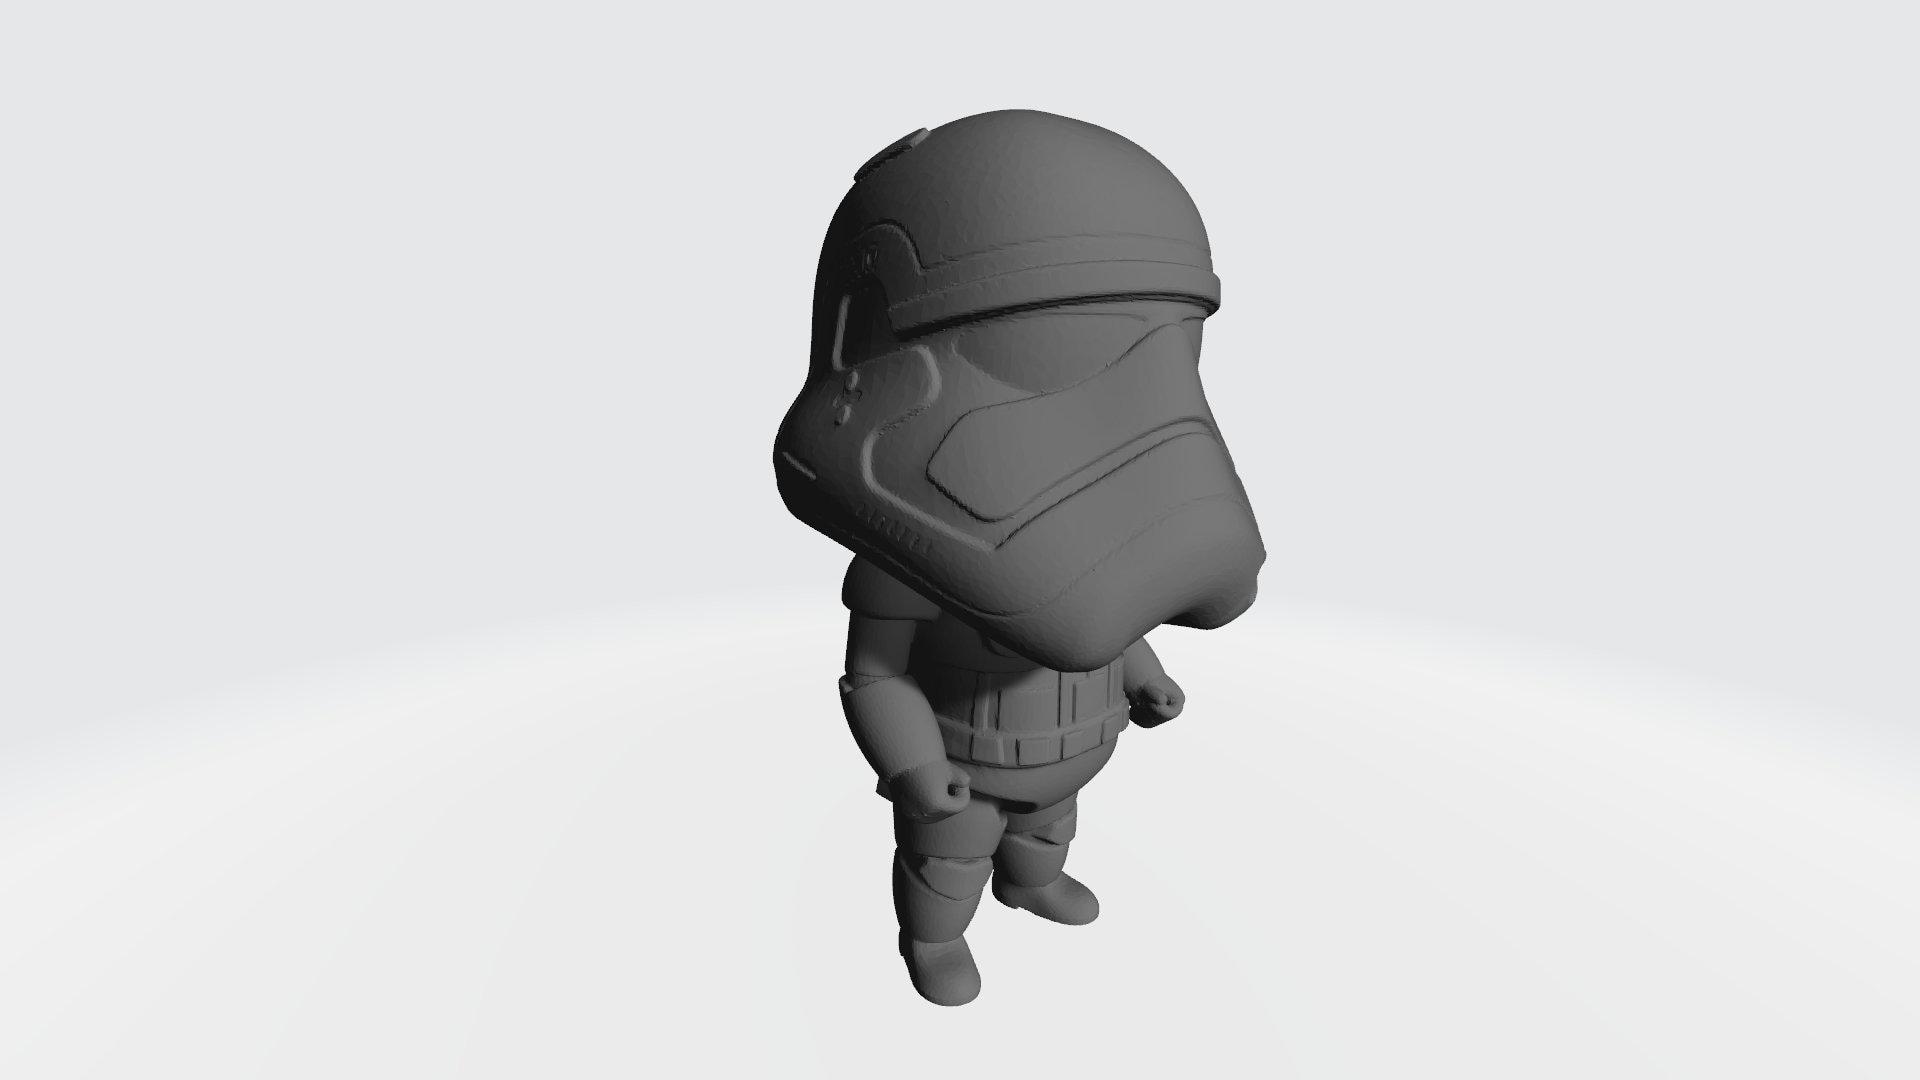 Cute Storm Trooper (Star Wars) 3D Printed Statue